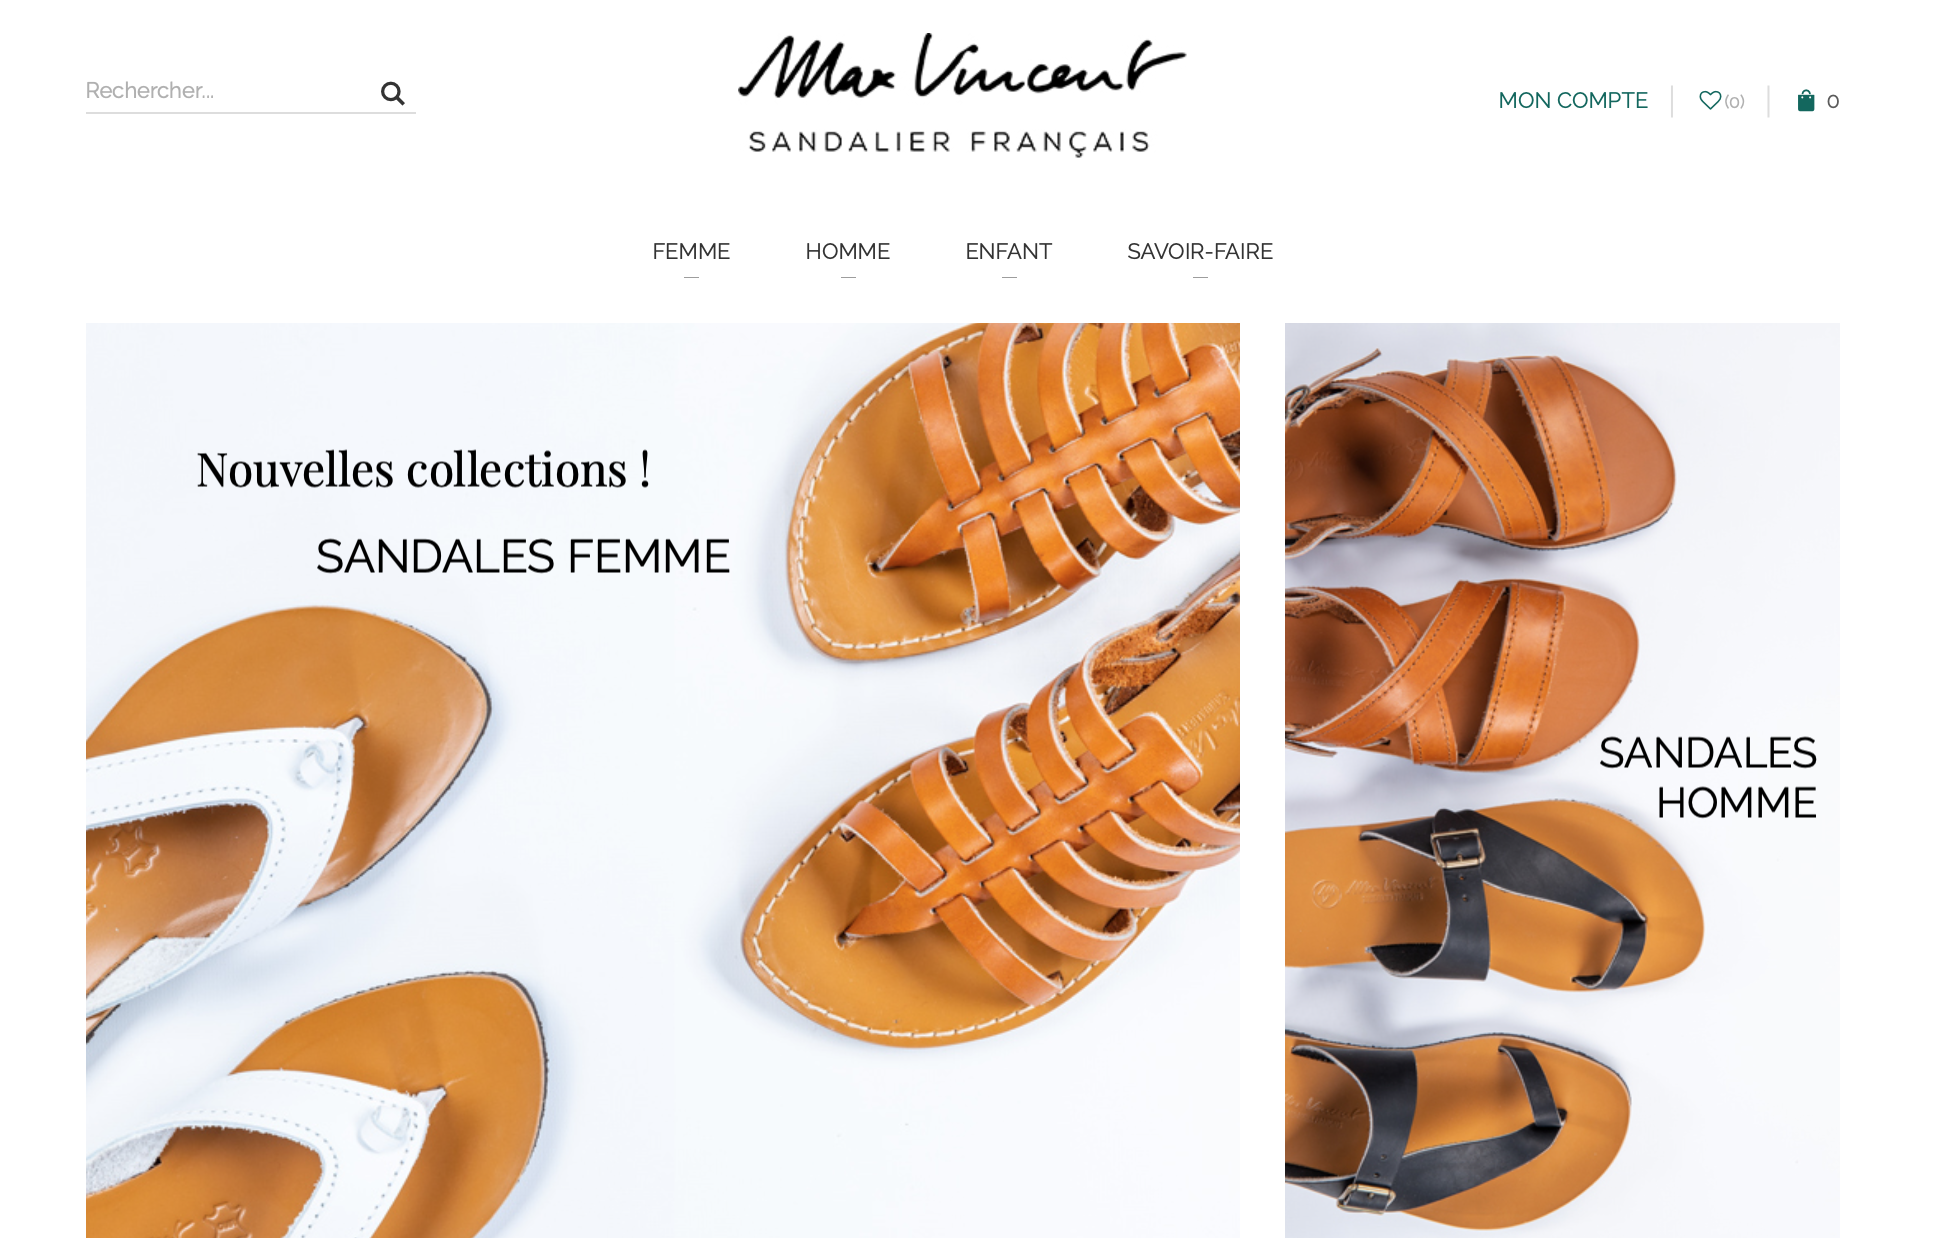 maxvincent.fr